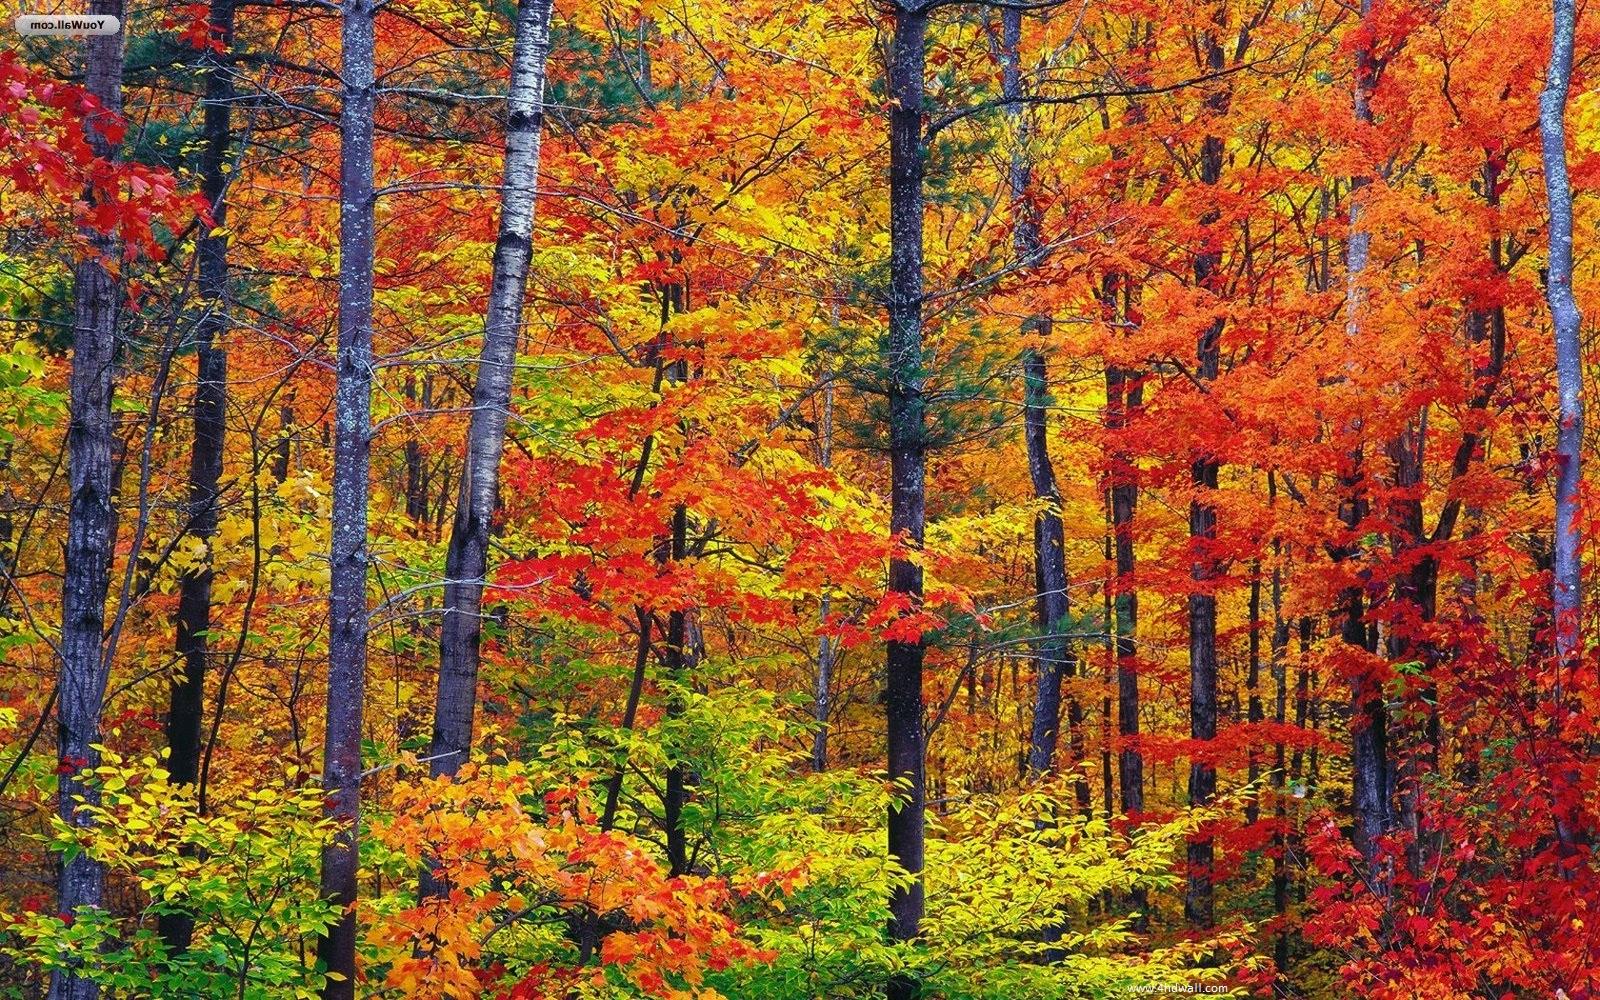 Fall Season Desktop Backgrounds Desktop Image 1600x1000